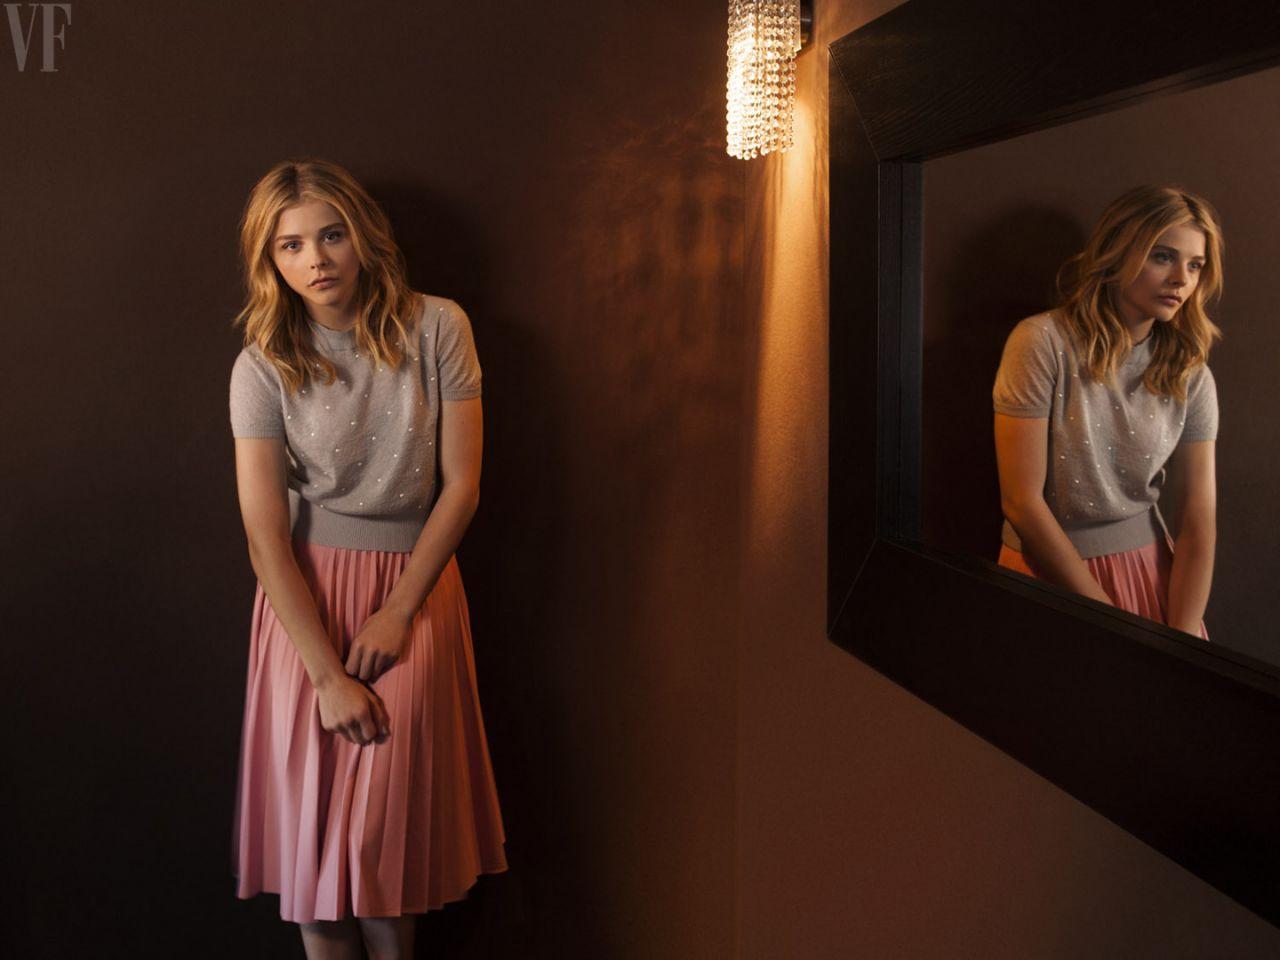 Chloe Grace Moretz - Portraits Taken at Cannes Film Festival 2014